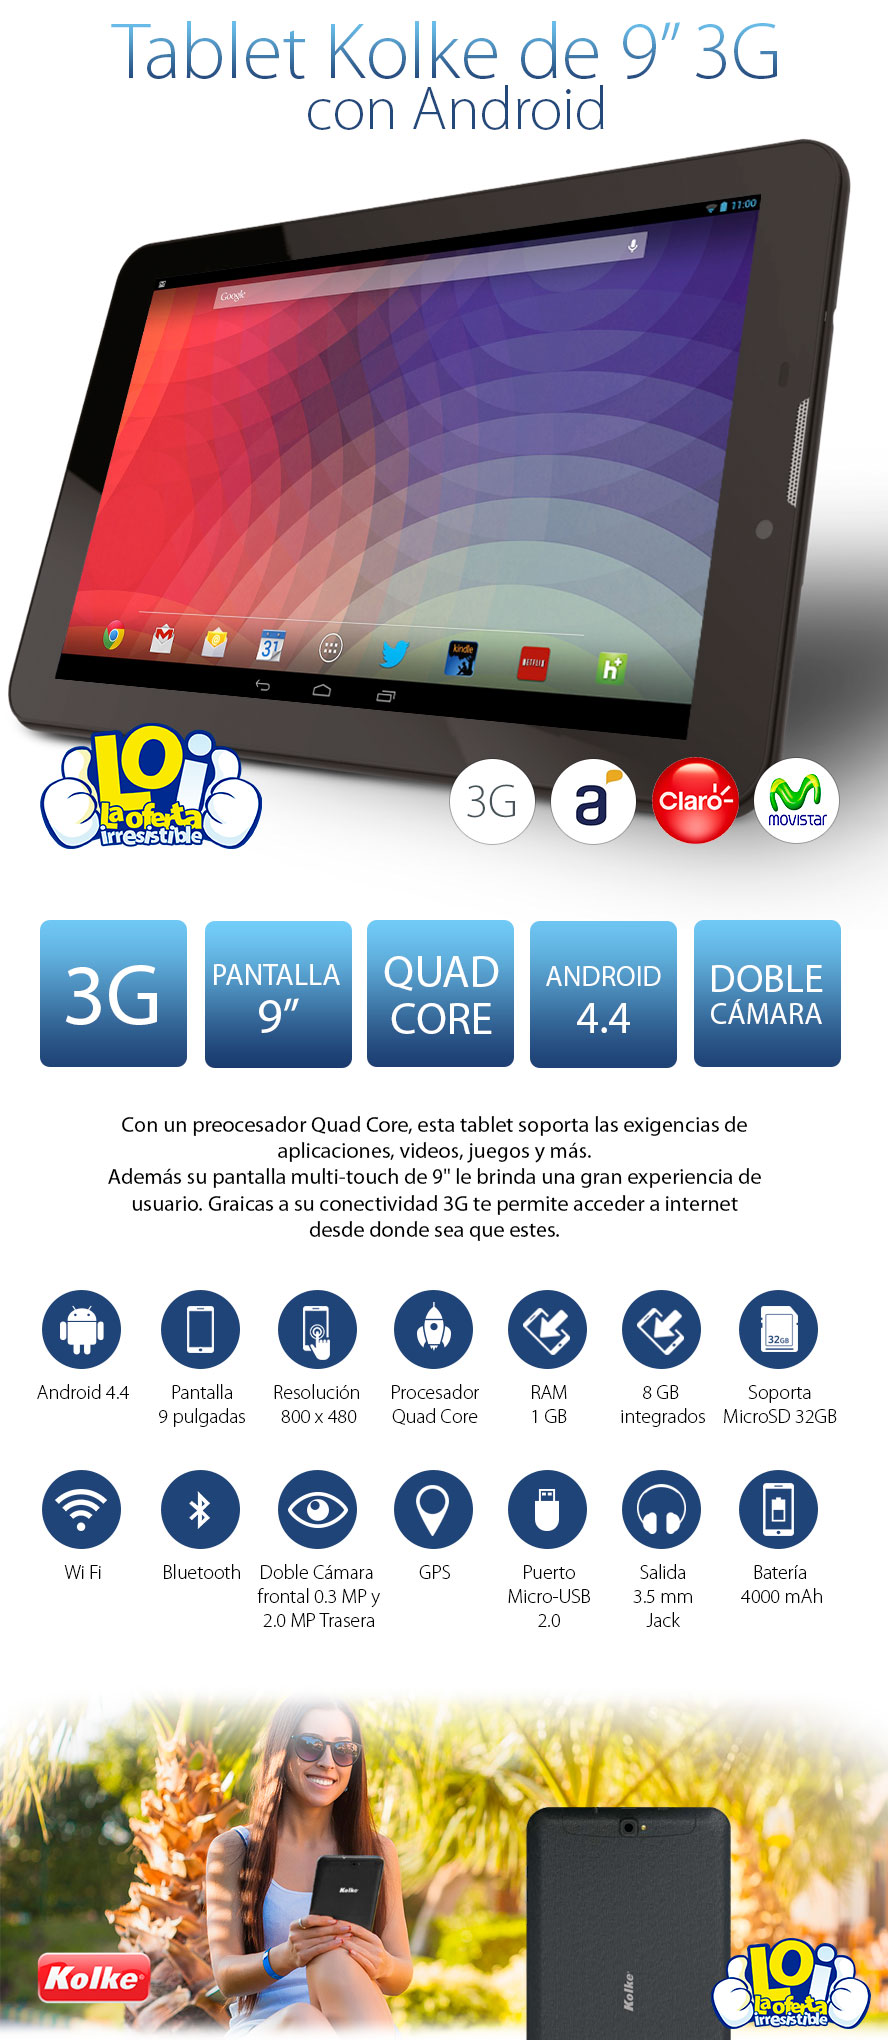 Tablet kolke 9 quad core conectividad 3g celular oferta for Salida de envio de oficina de cambio de destino